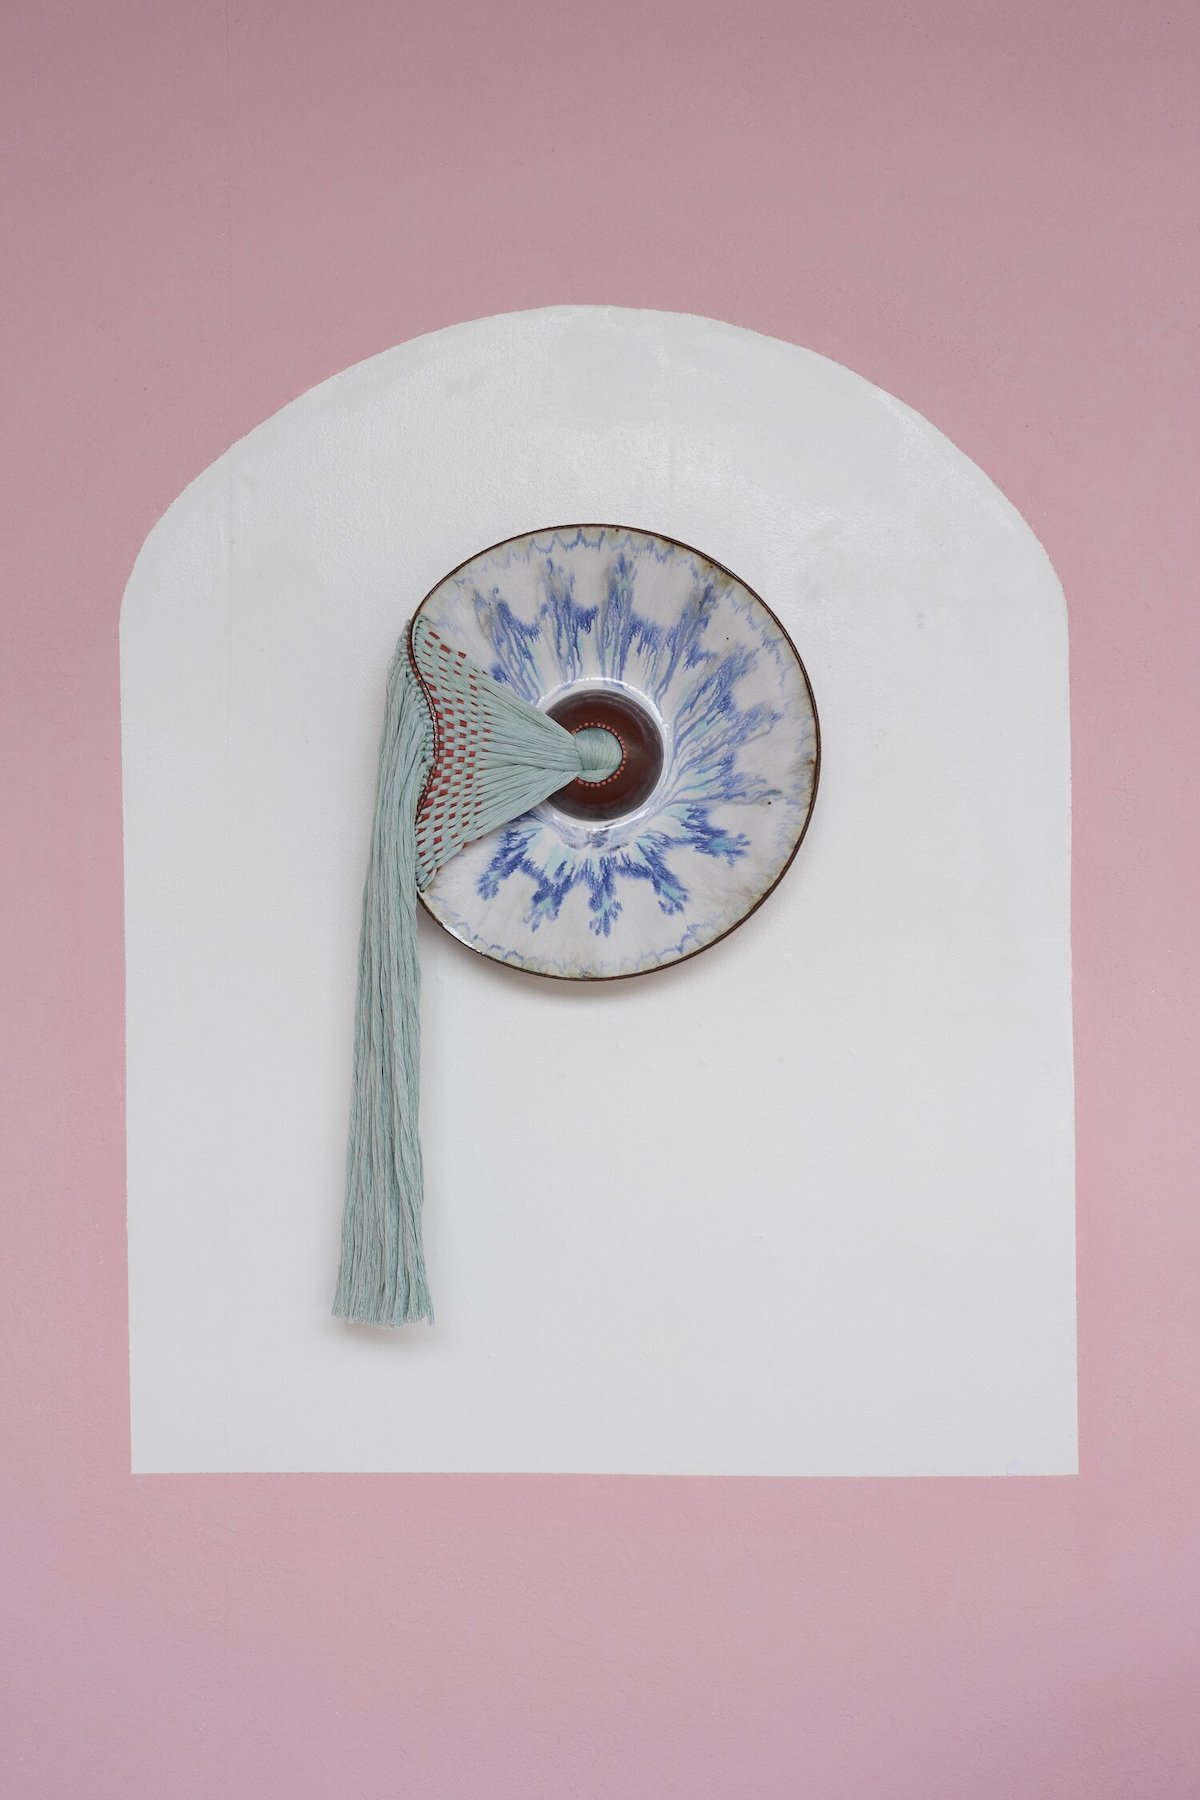 Braided Fiber and Ceramic Sculpture by Nicole McLaughlin